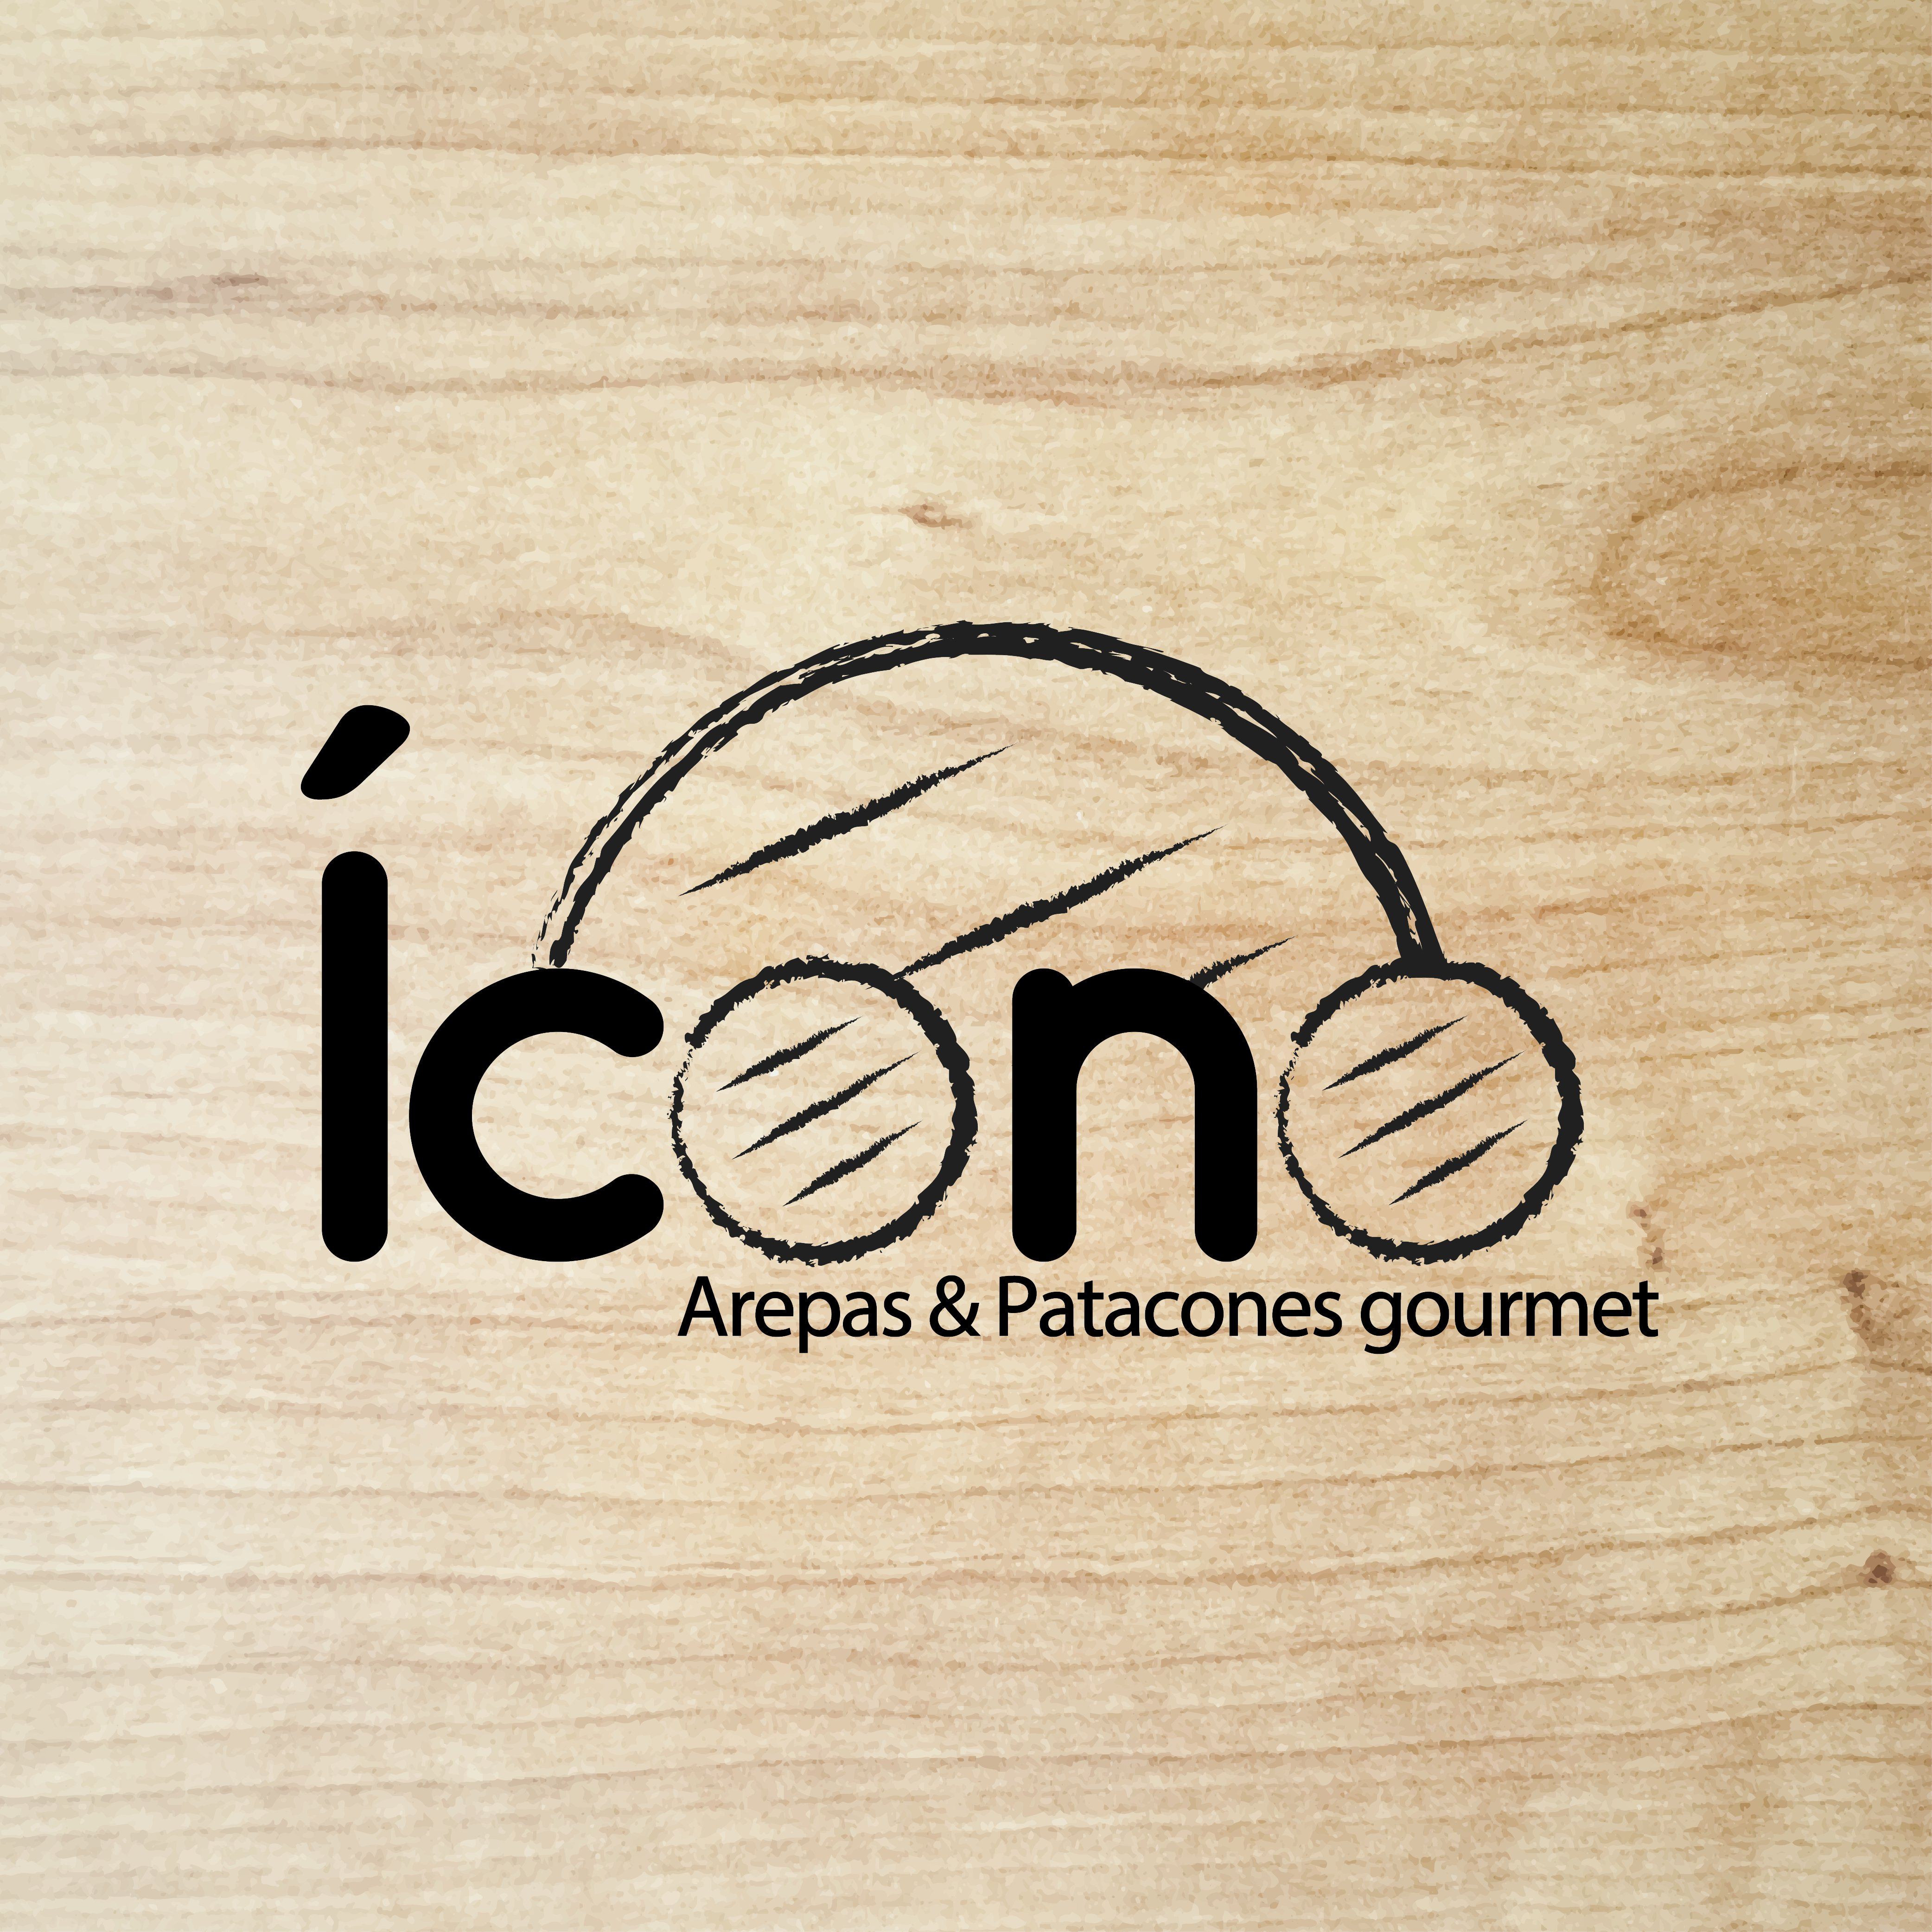 Icono Arepas & Patacones Gourmet